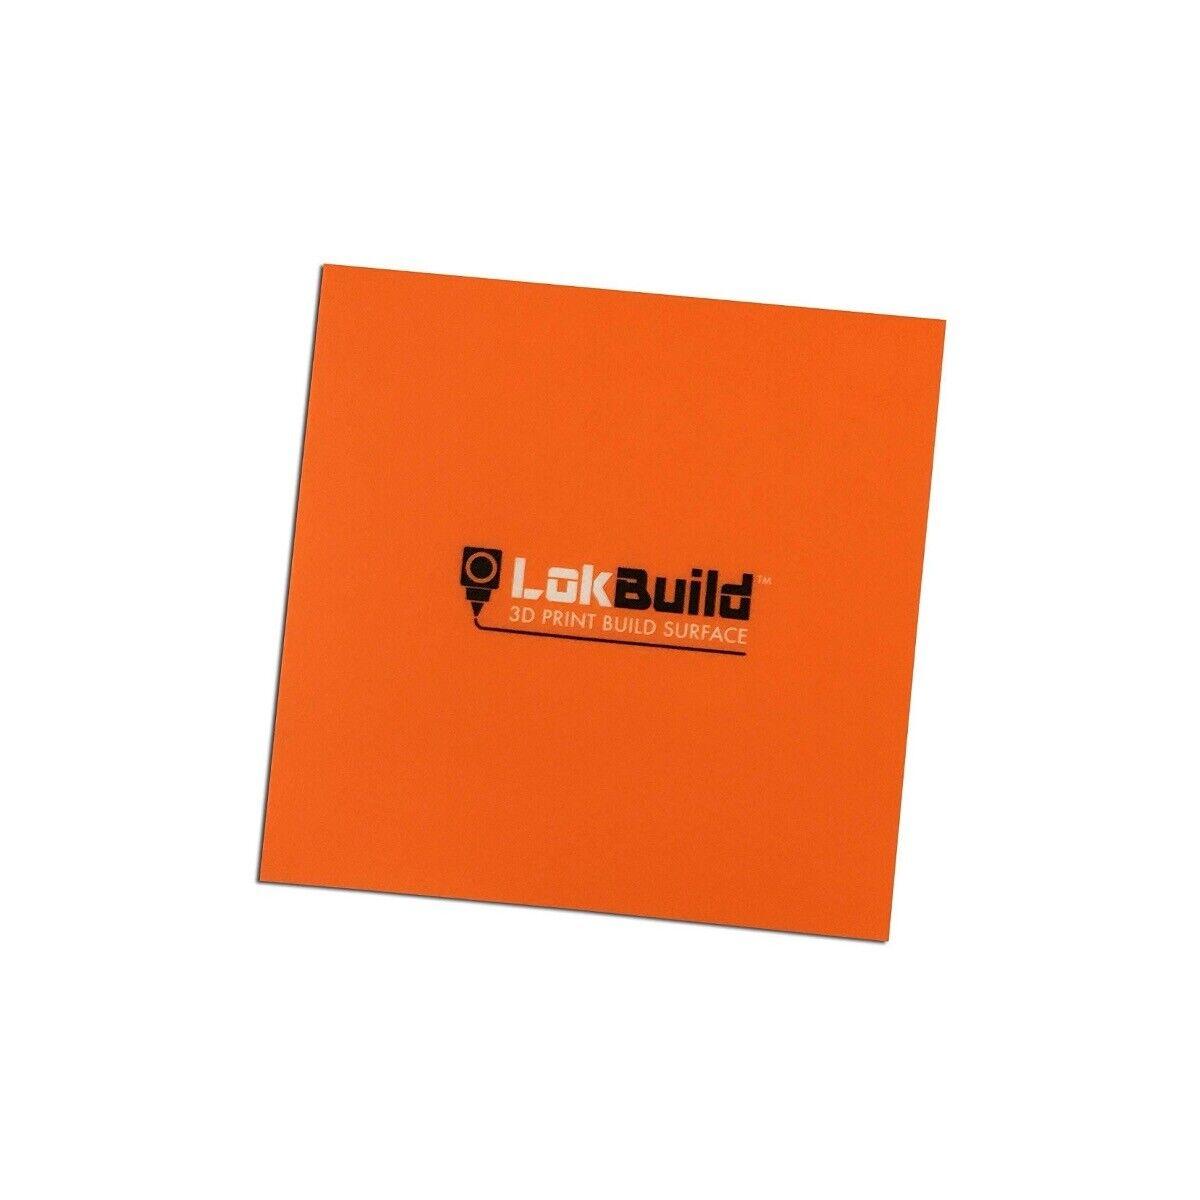 [3DMakerWorld] LokBuild 3D Print Build Surface 6''